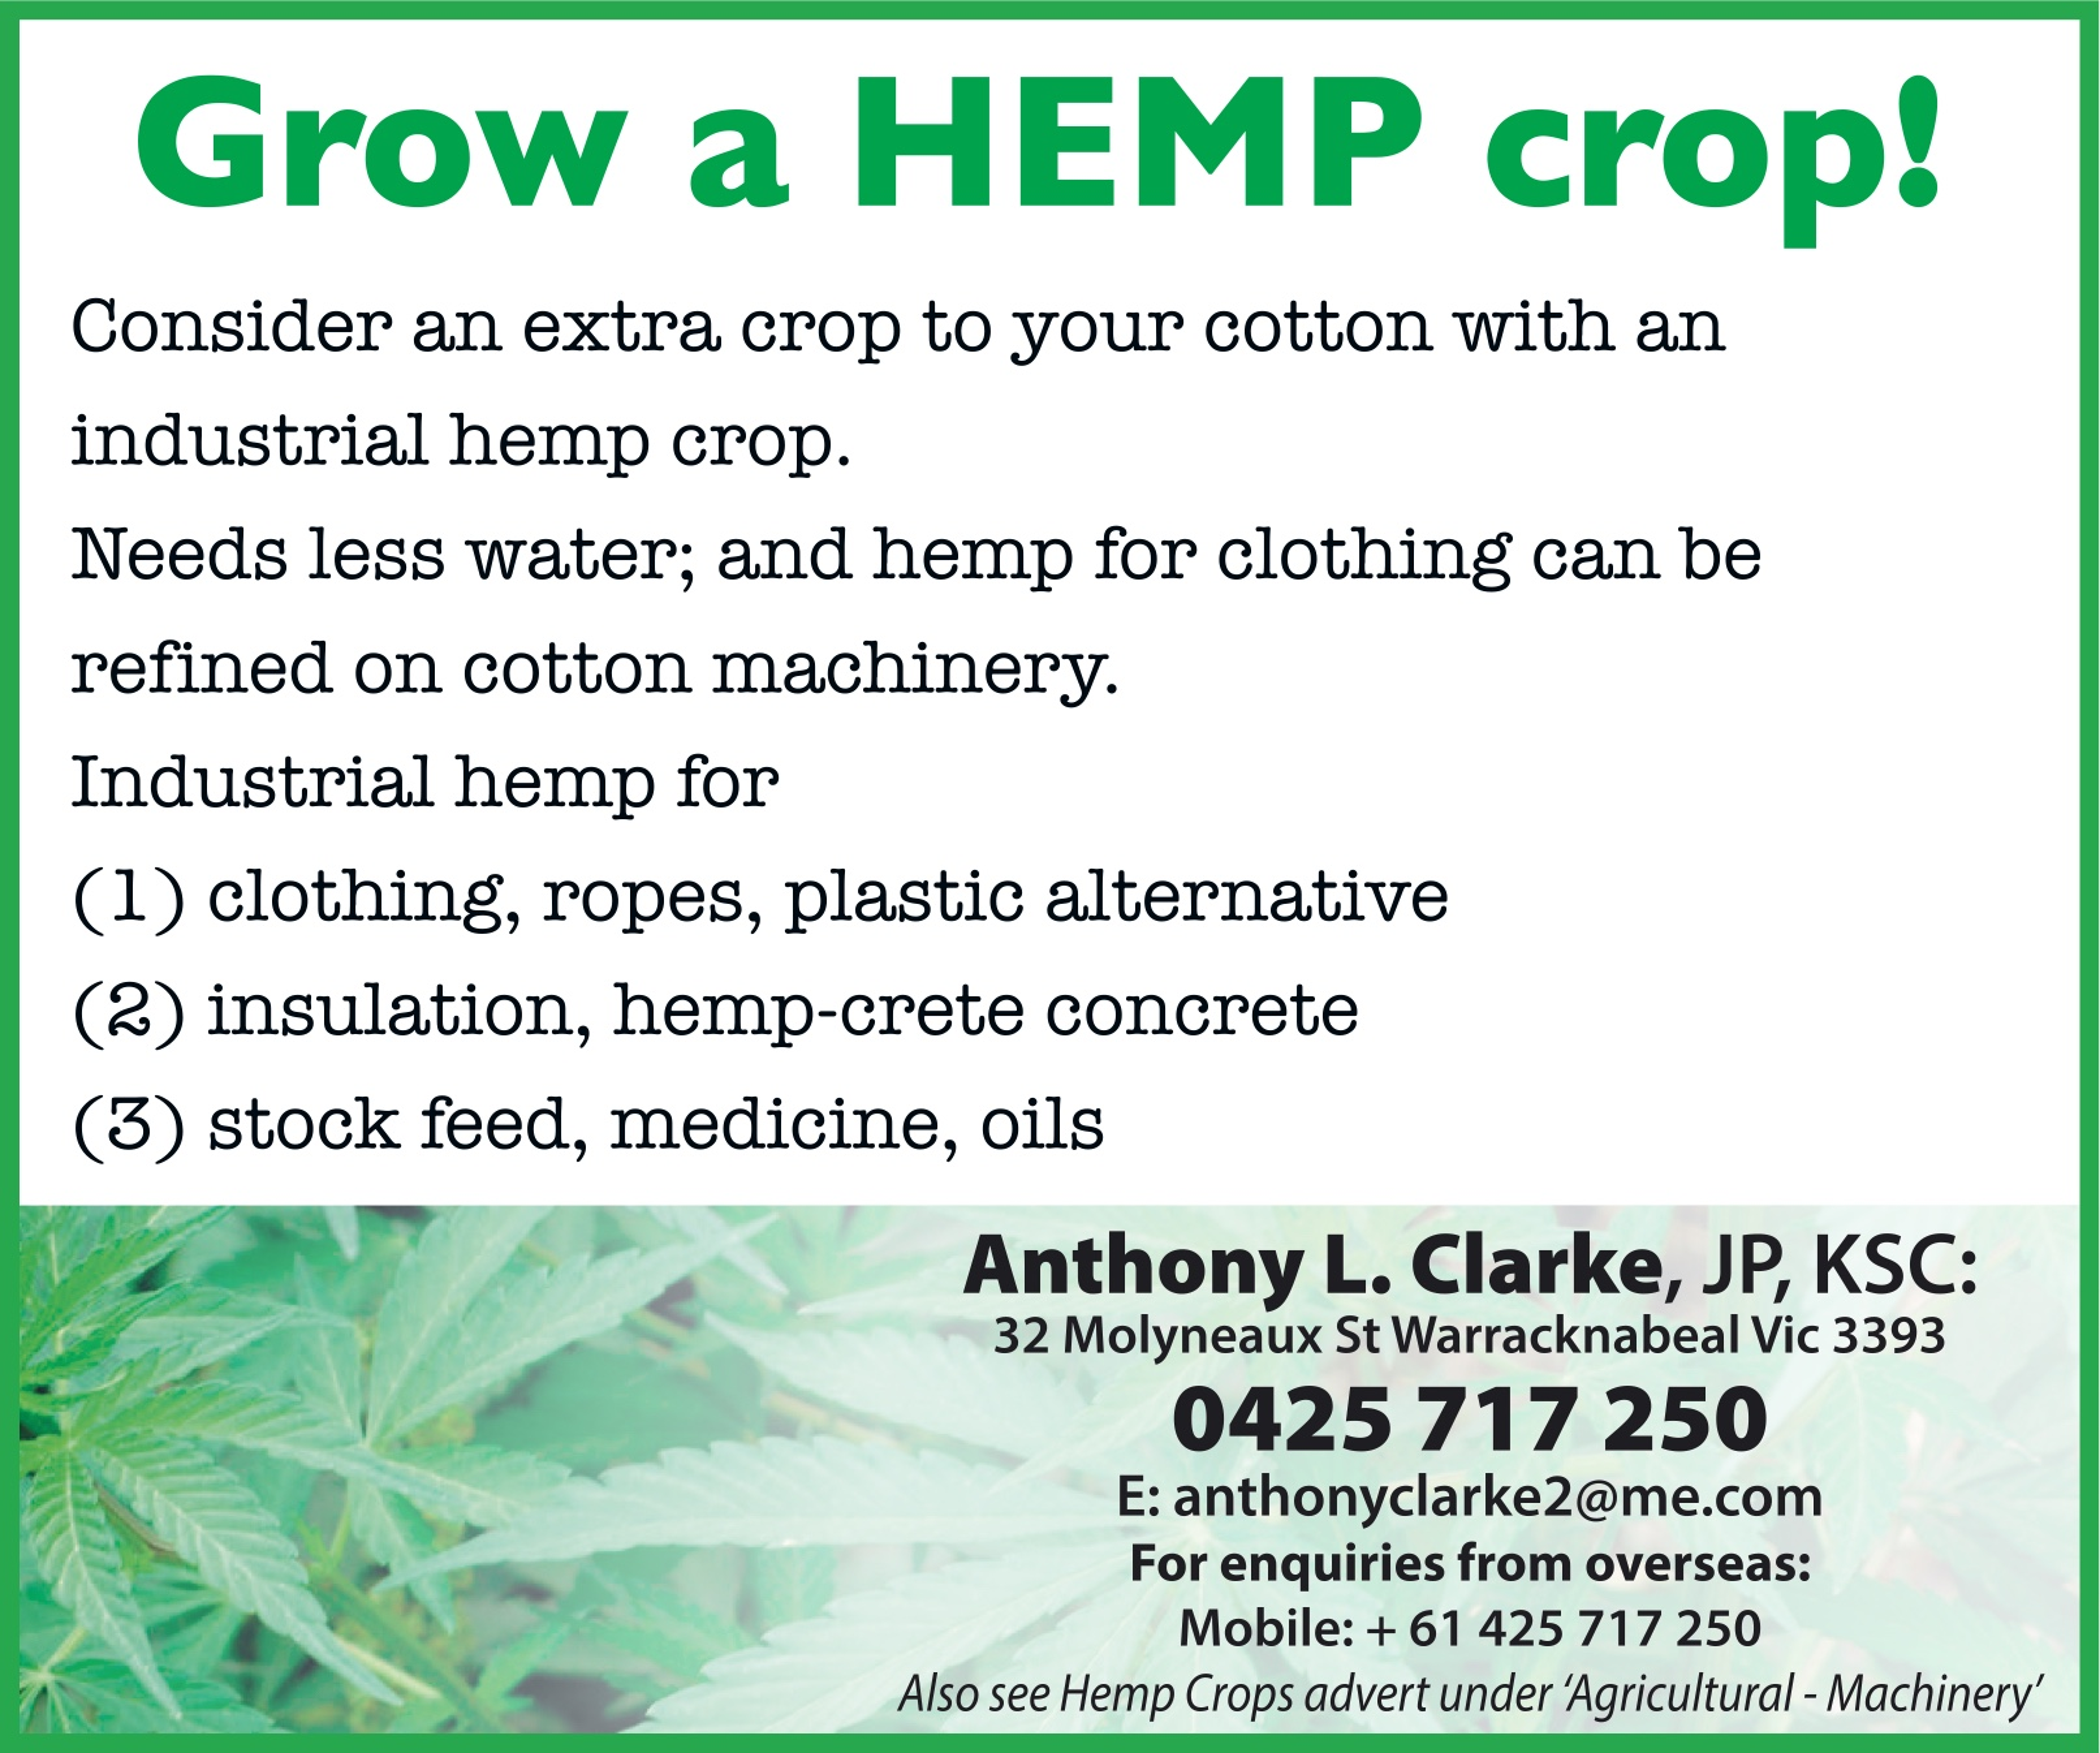 Hemp Crops - Agricultural